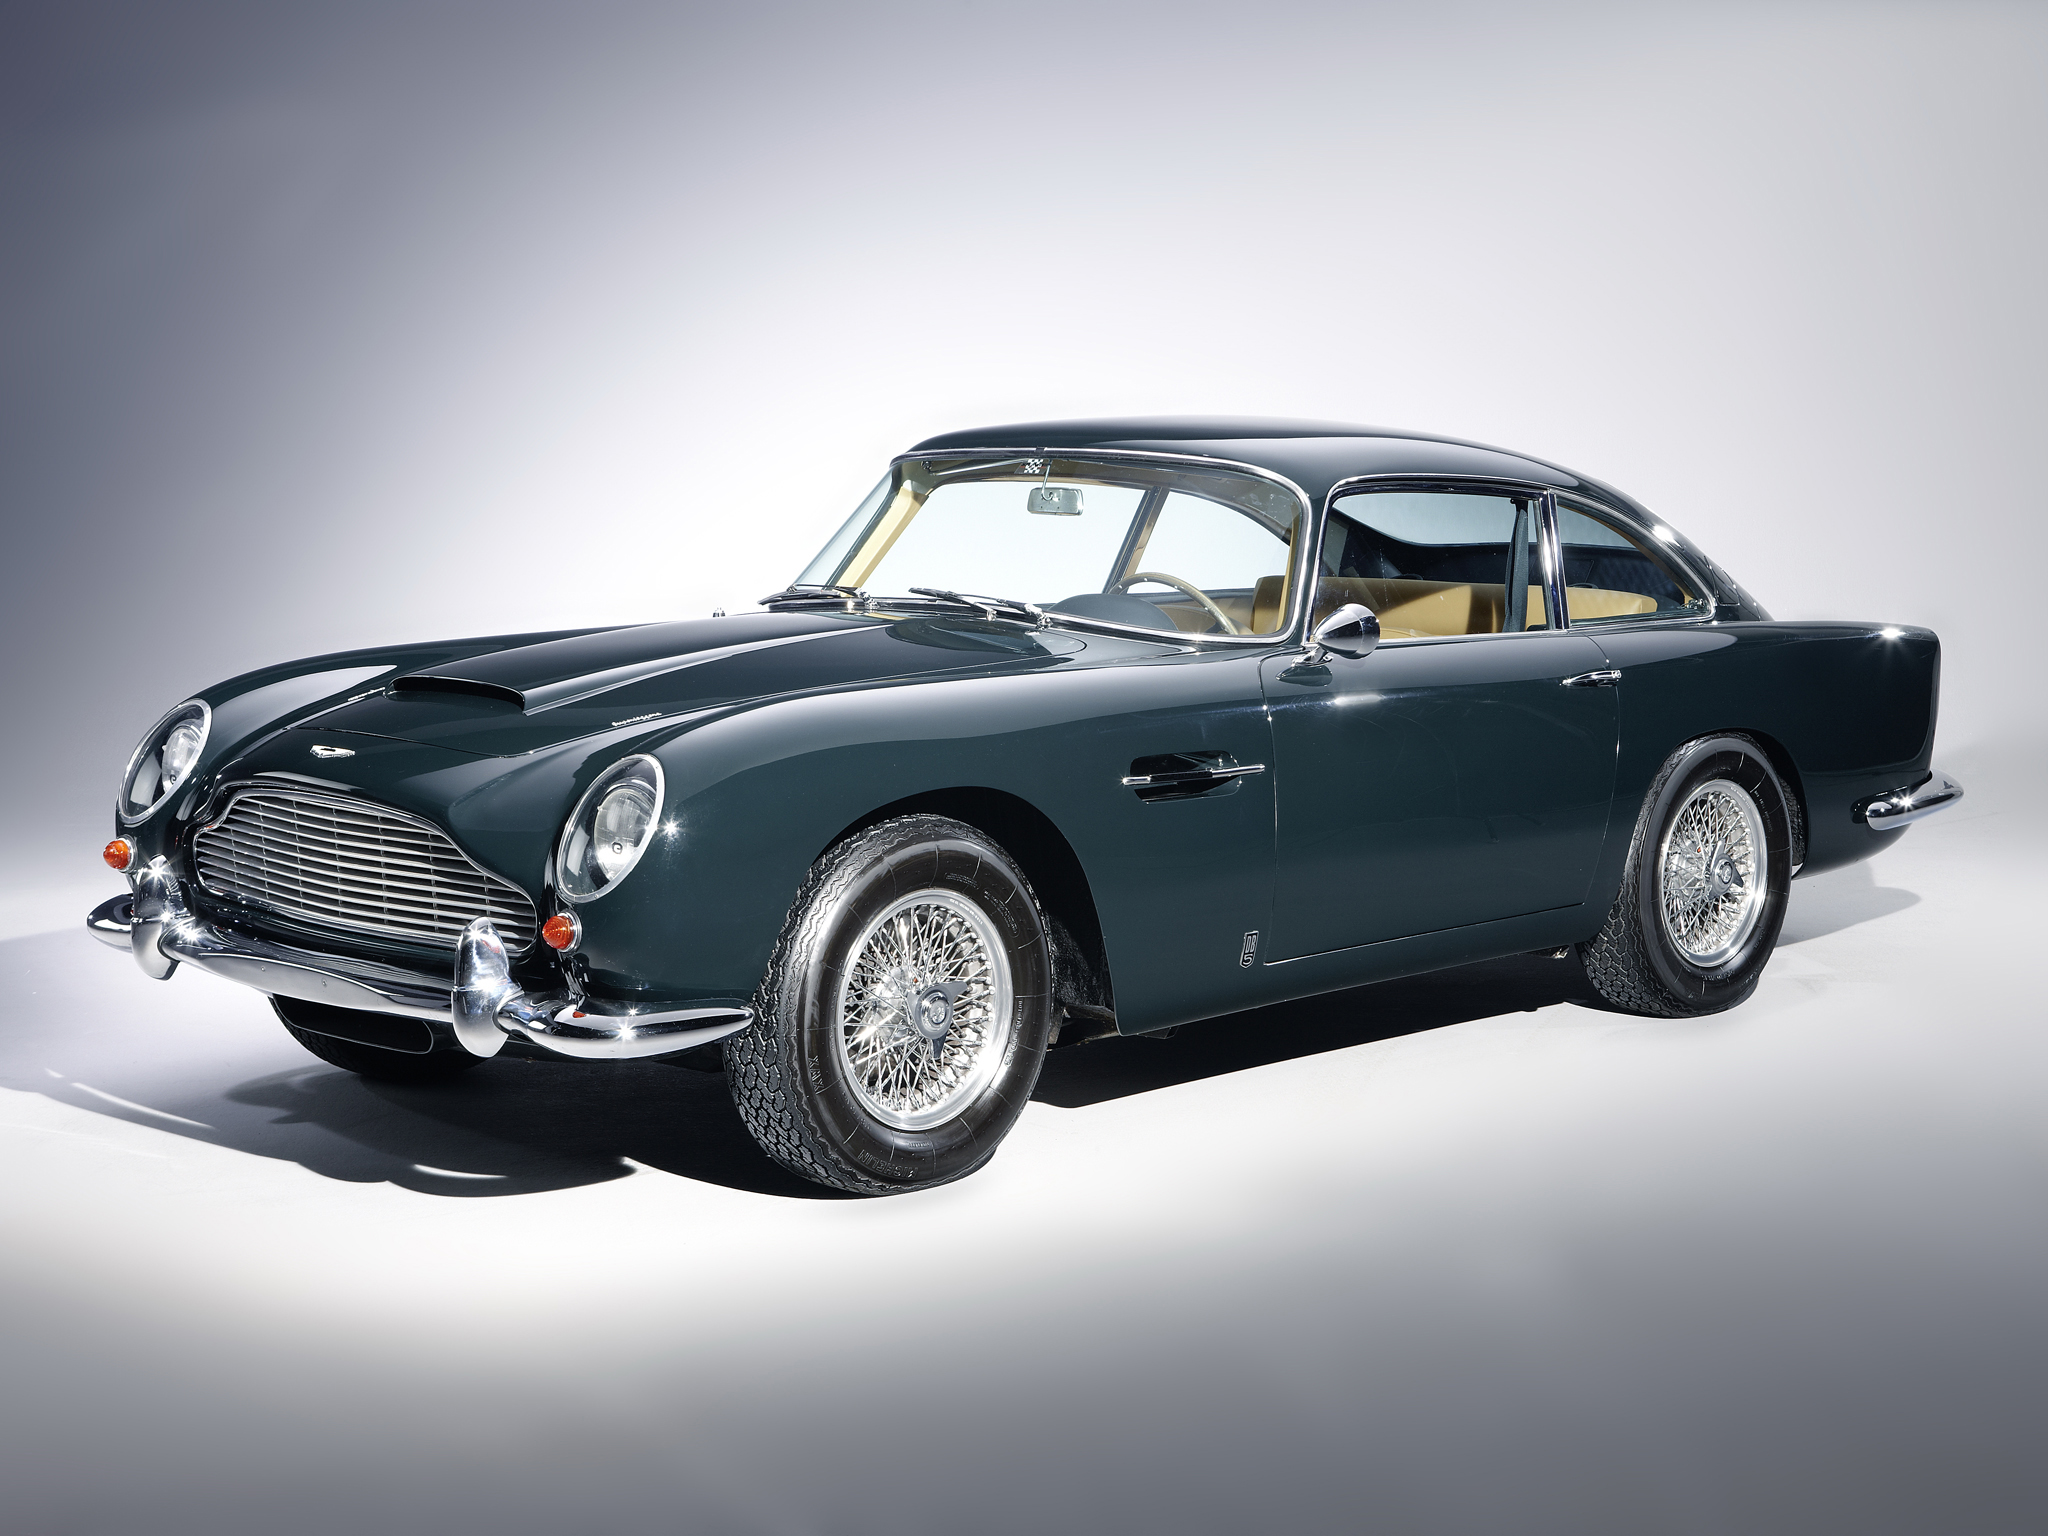 Aston Martin DB5 Vantage 19641965 wallpaper 2048x1536